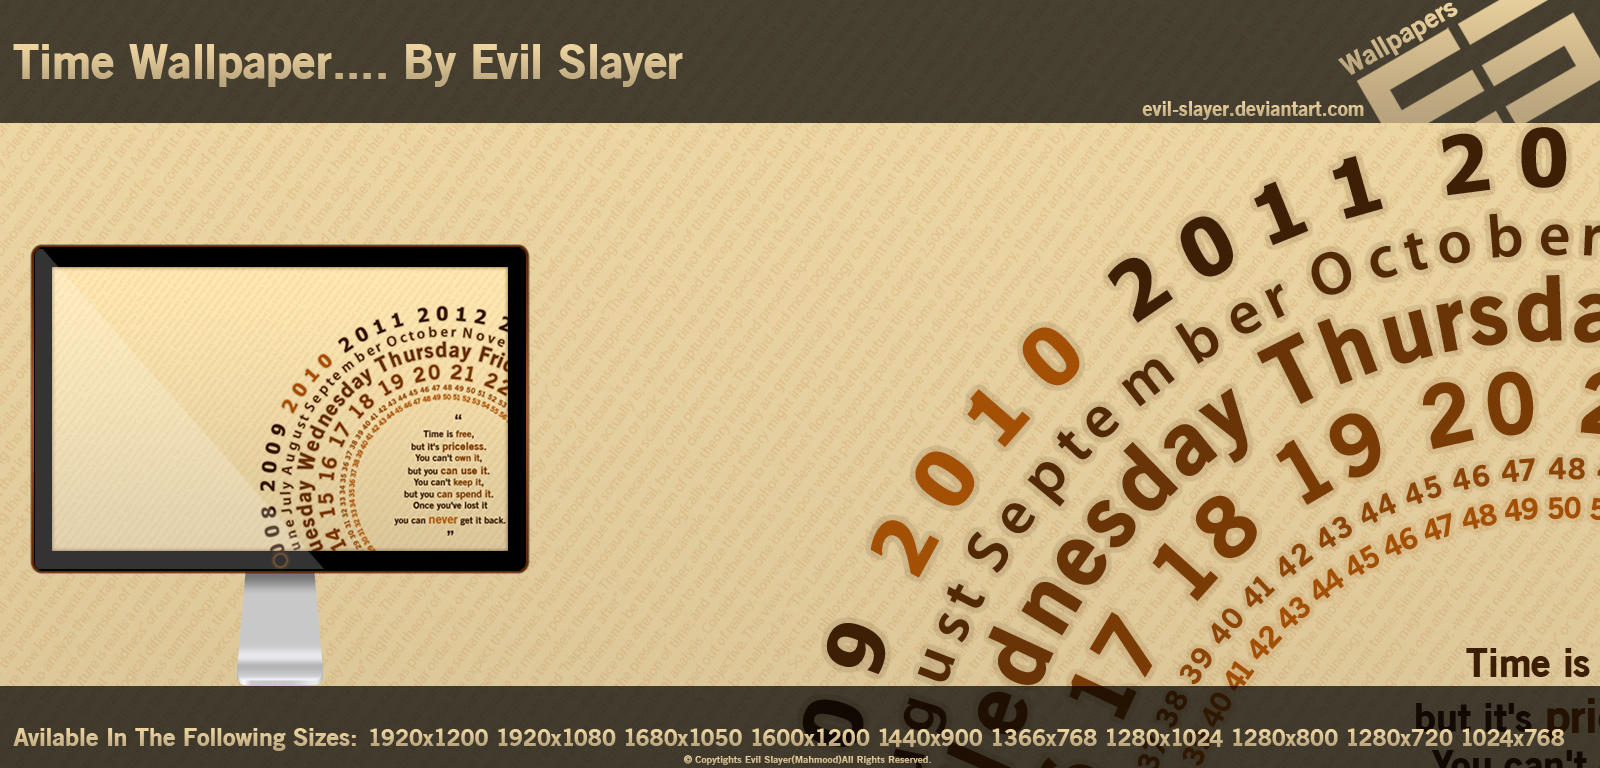 Time Wallpaper by Evil-Slayer